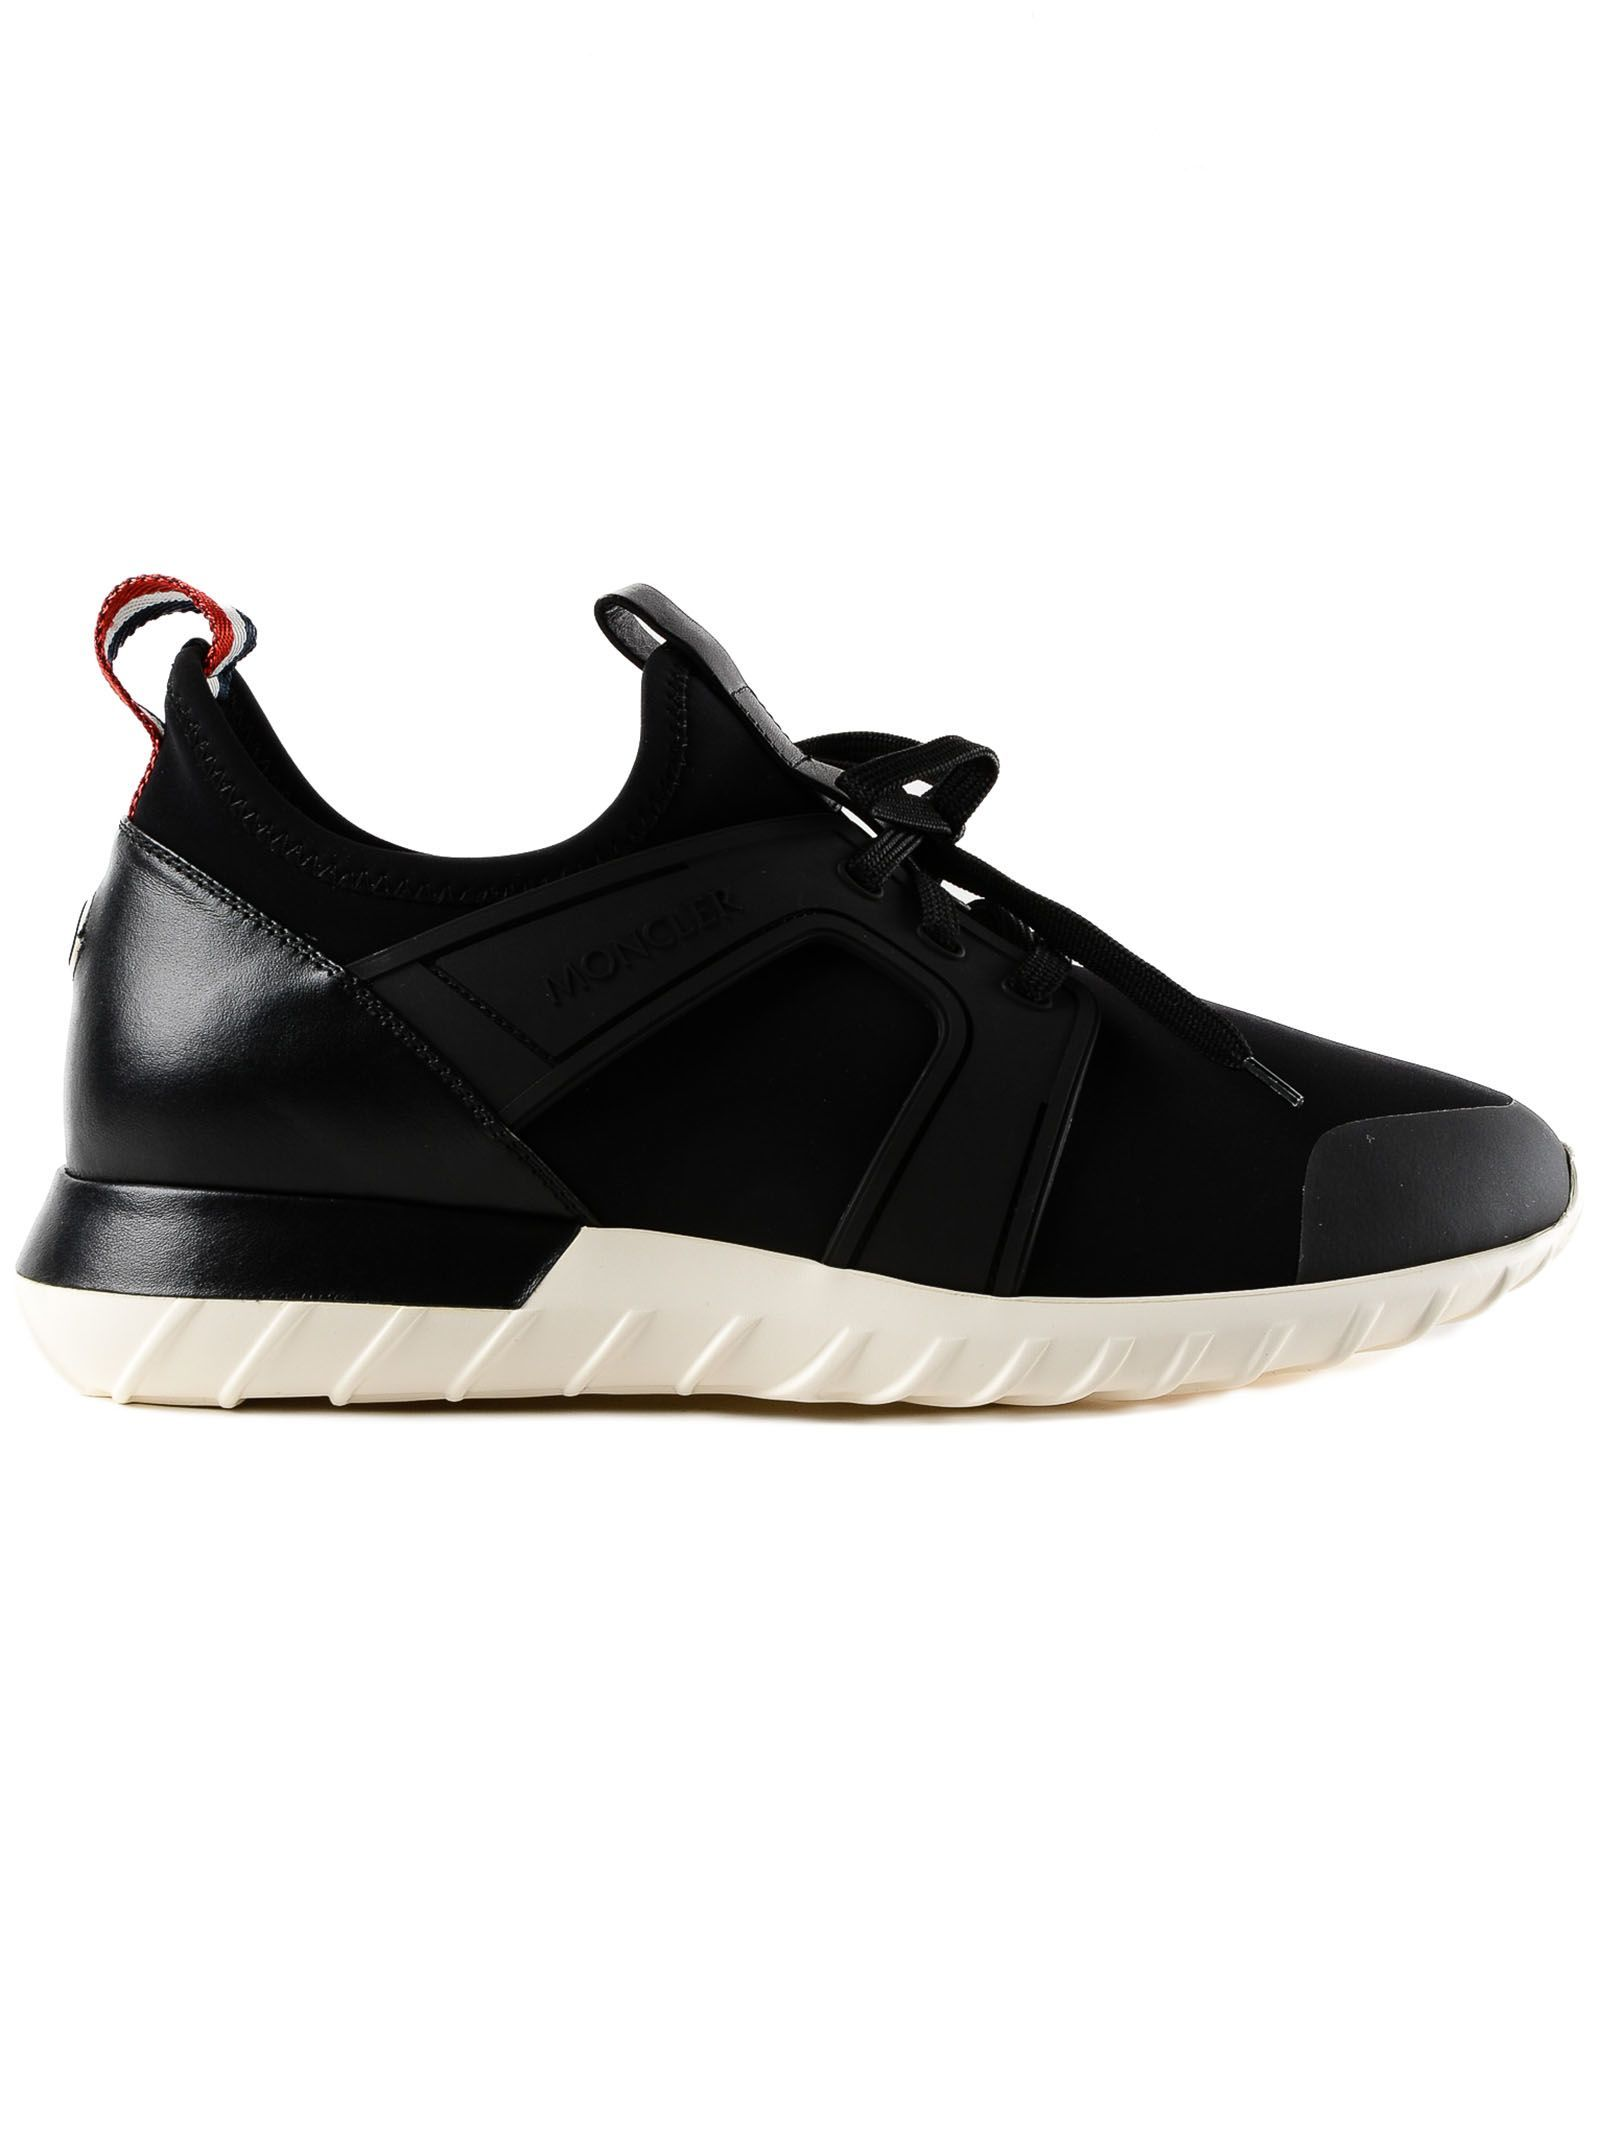 adidas Originals NMD R2 Primeknit Baskets Noir BY9696 RSITalEd